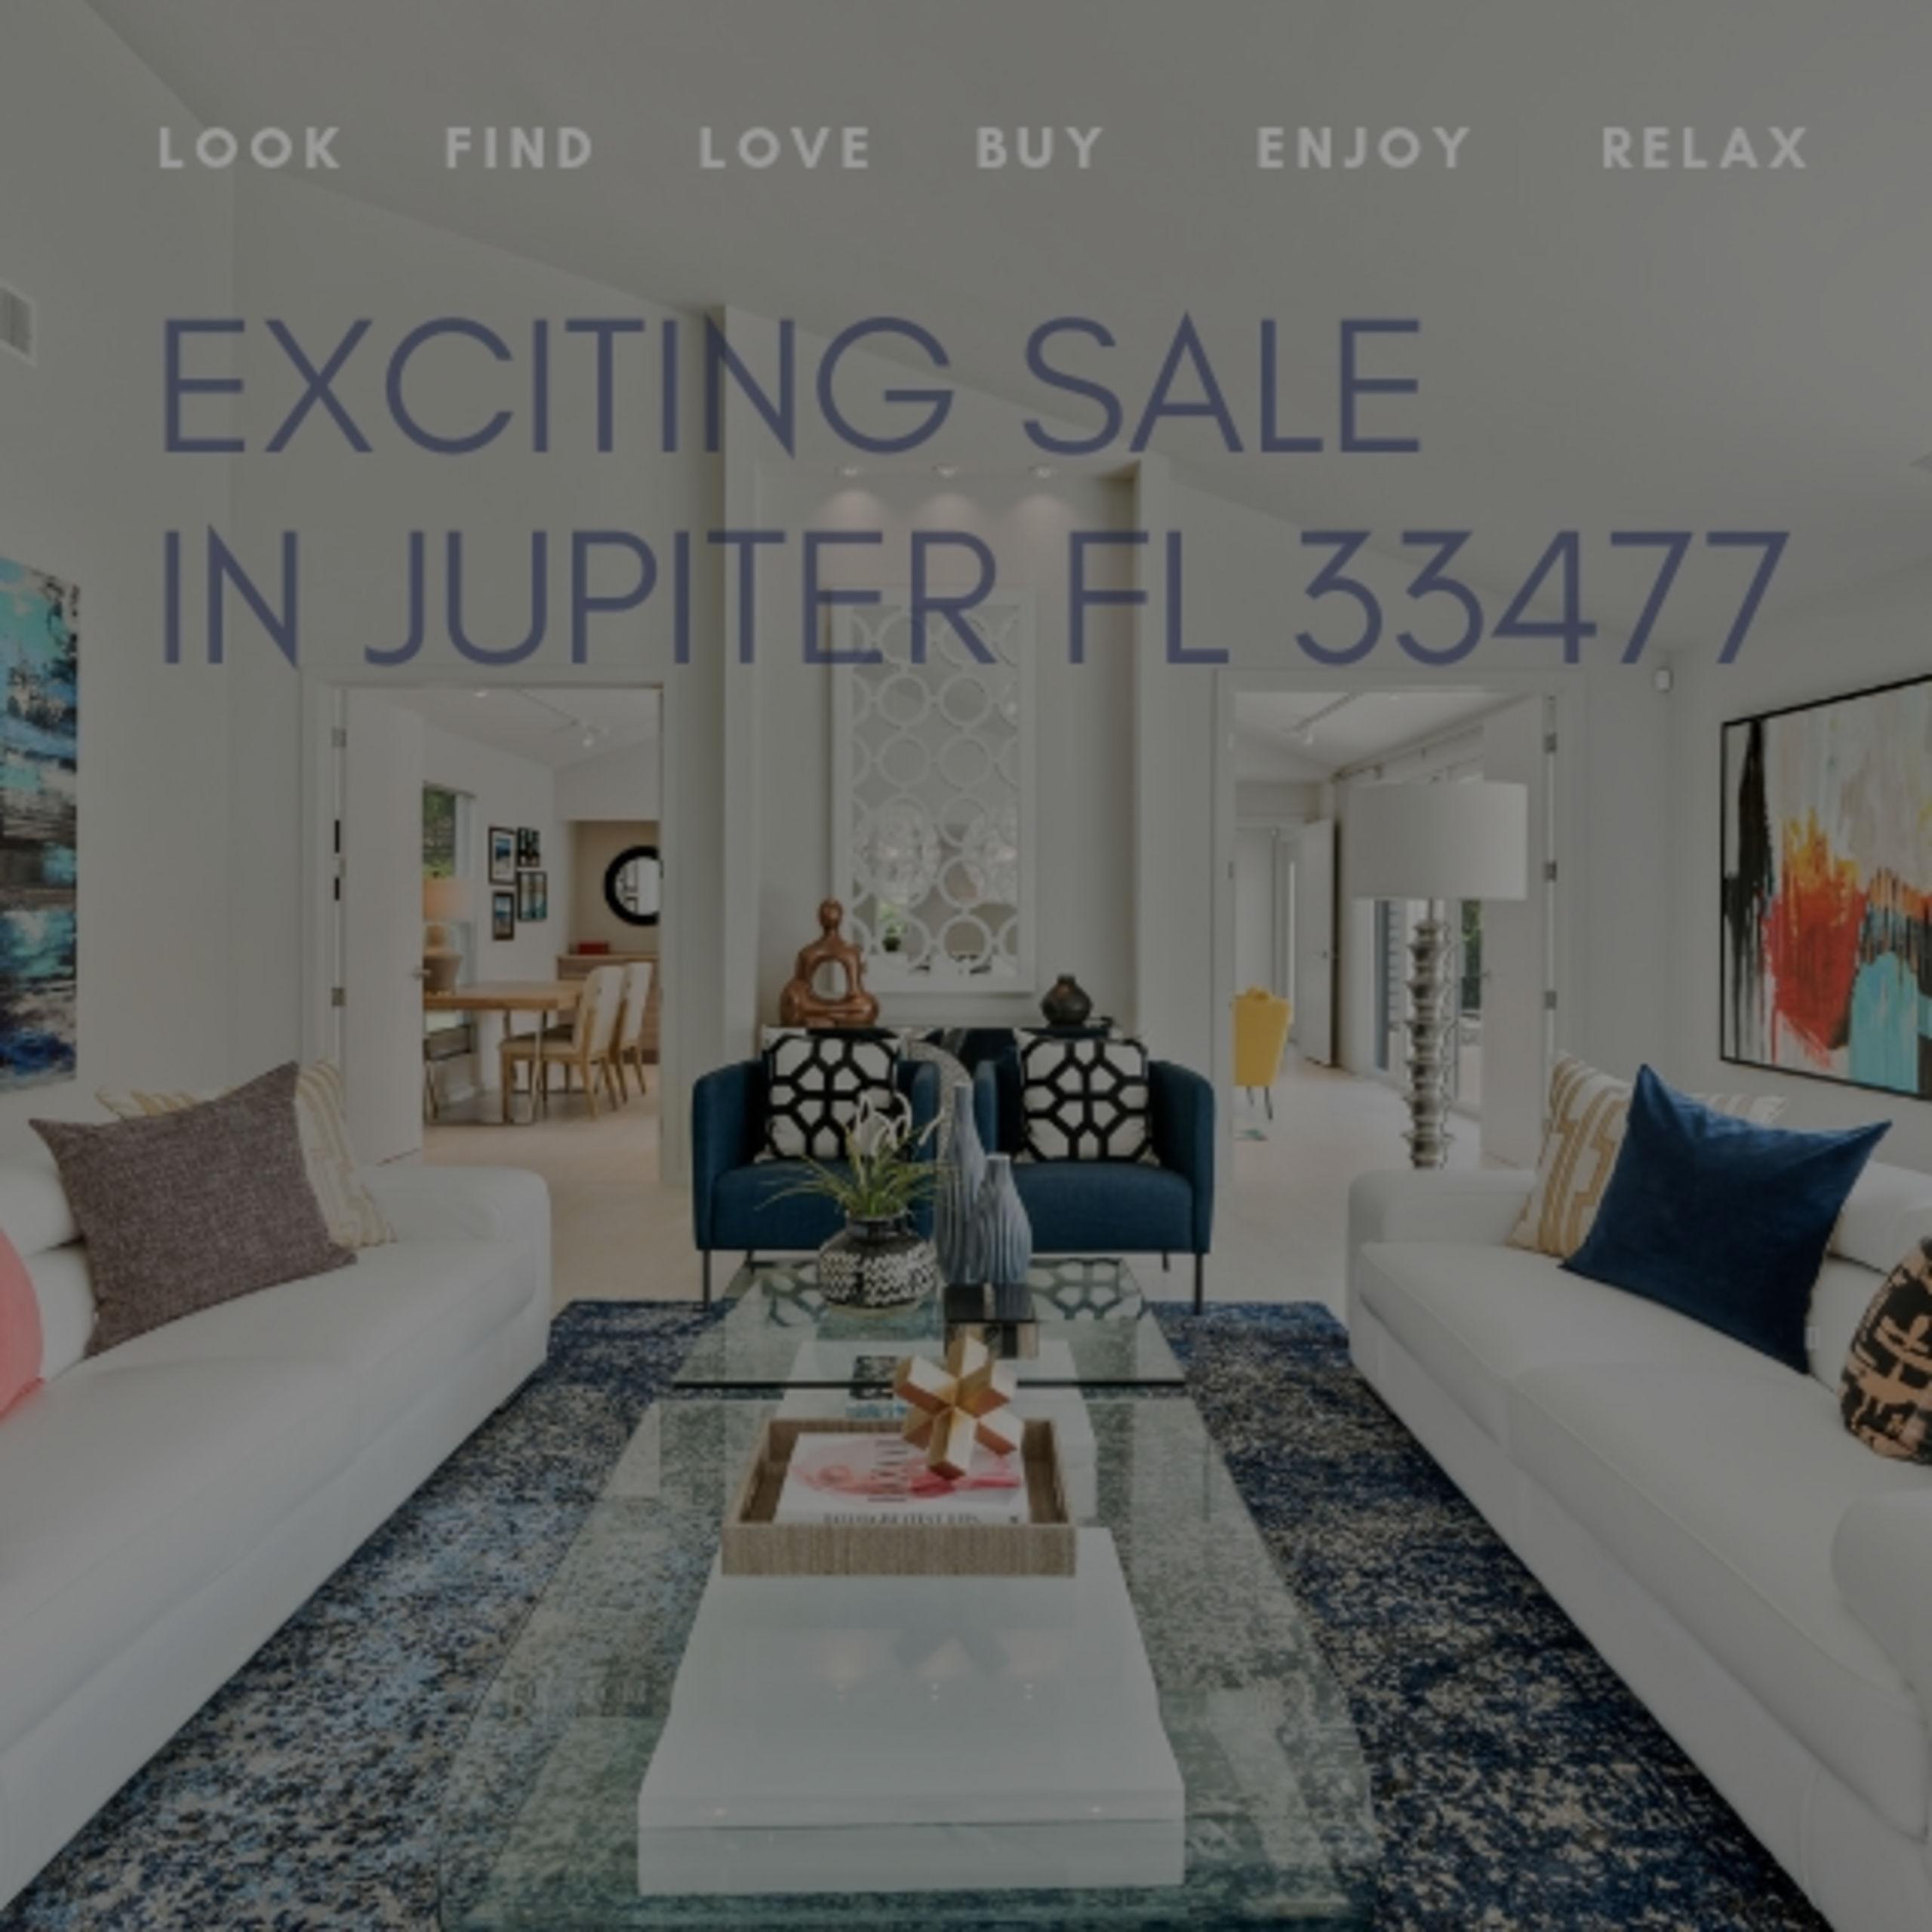 Sold by Jupiter Beach